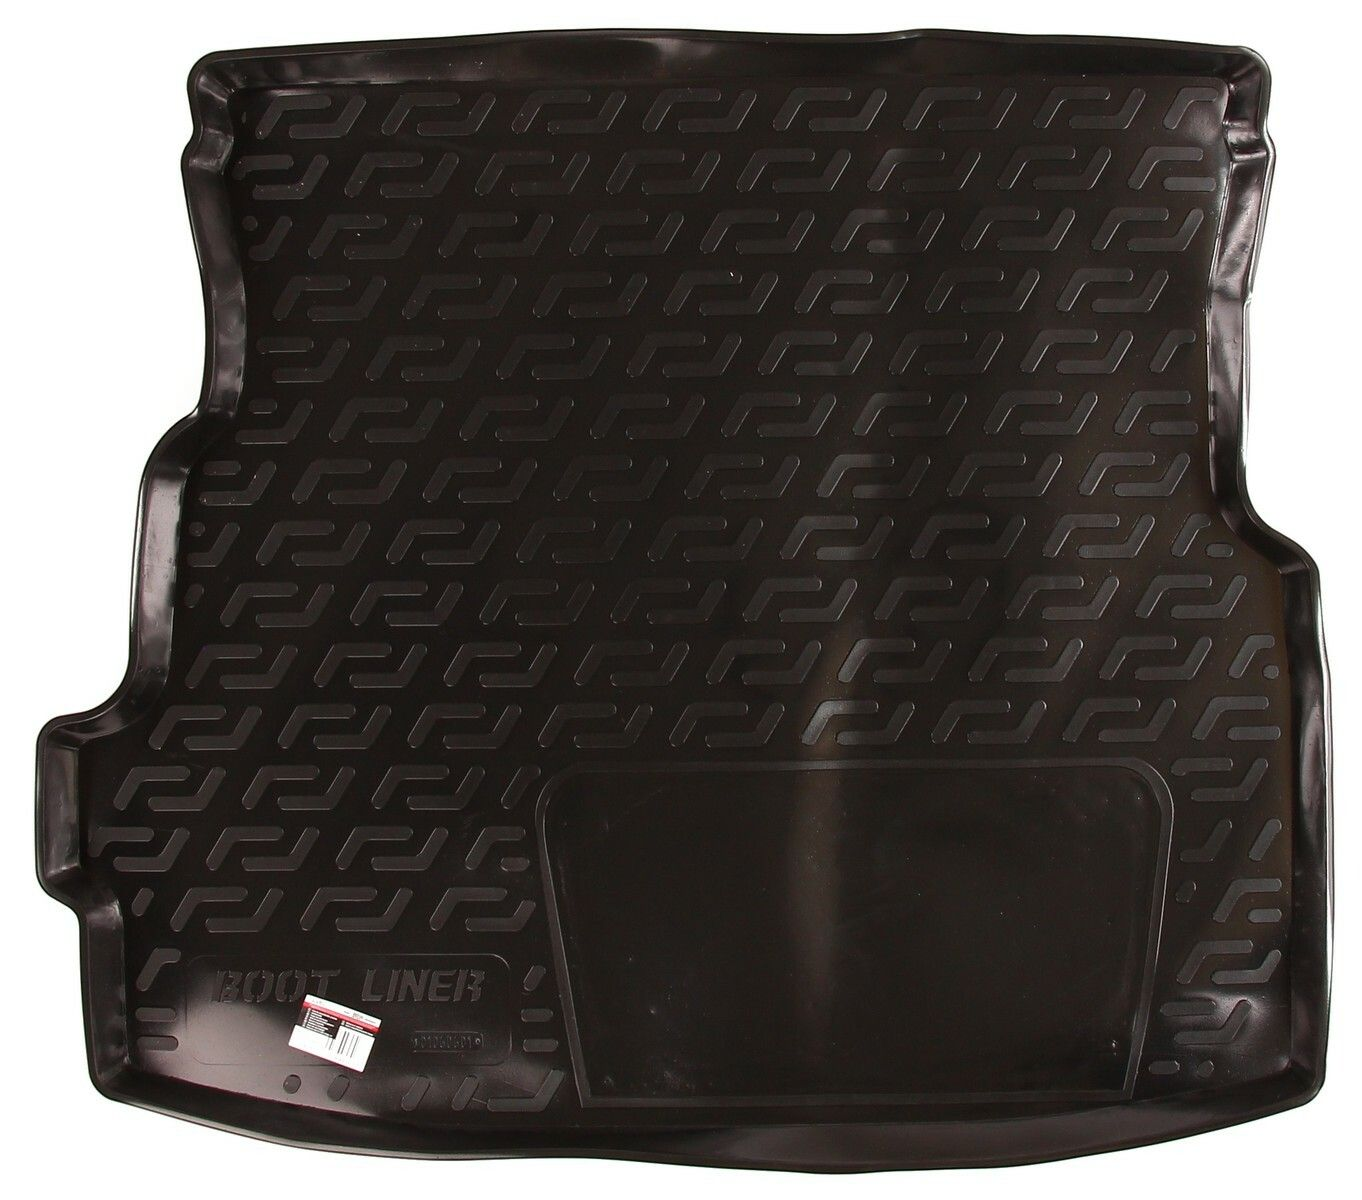 Vana do kufru plastová Renault Thalia I / Symbol / Clio I Symbol (99-10) SIXTOL